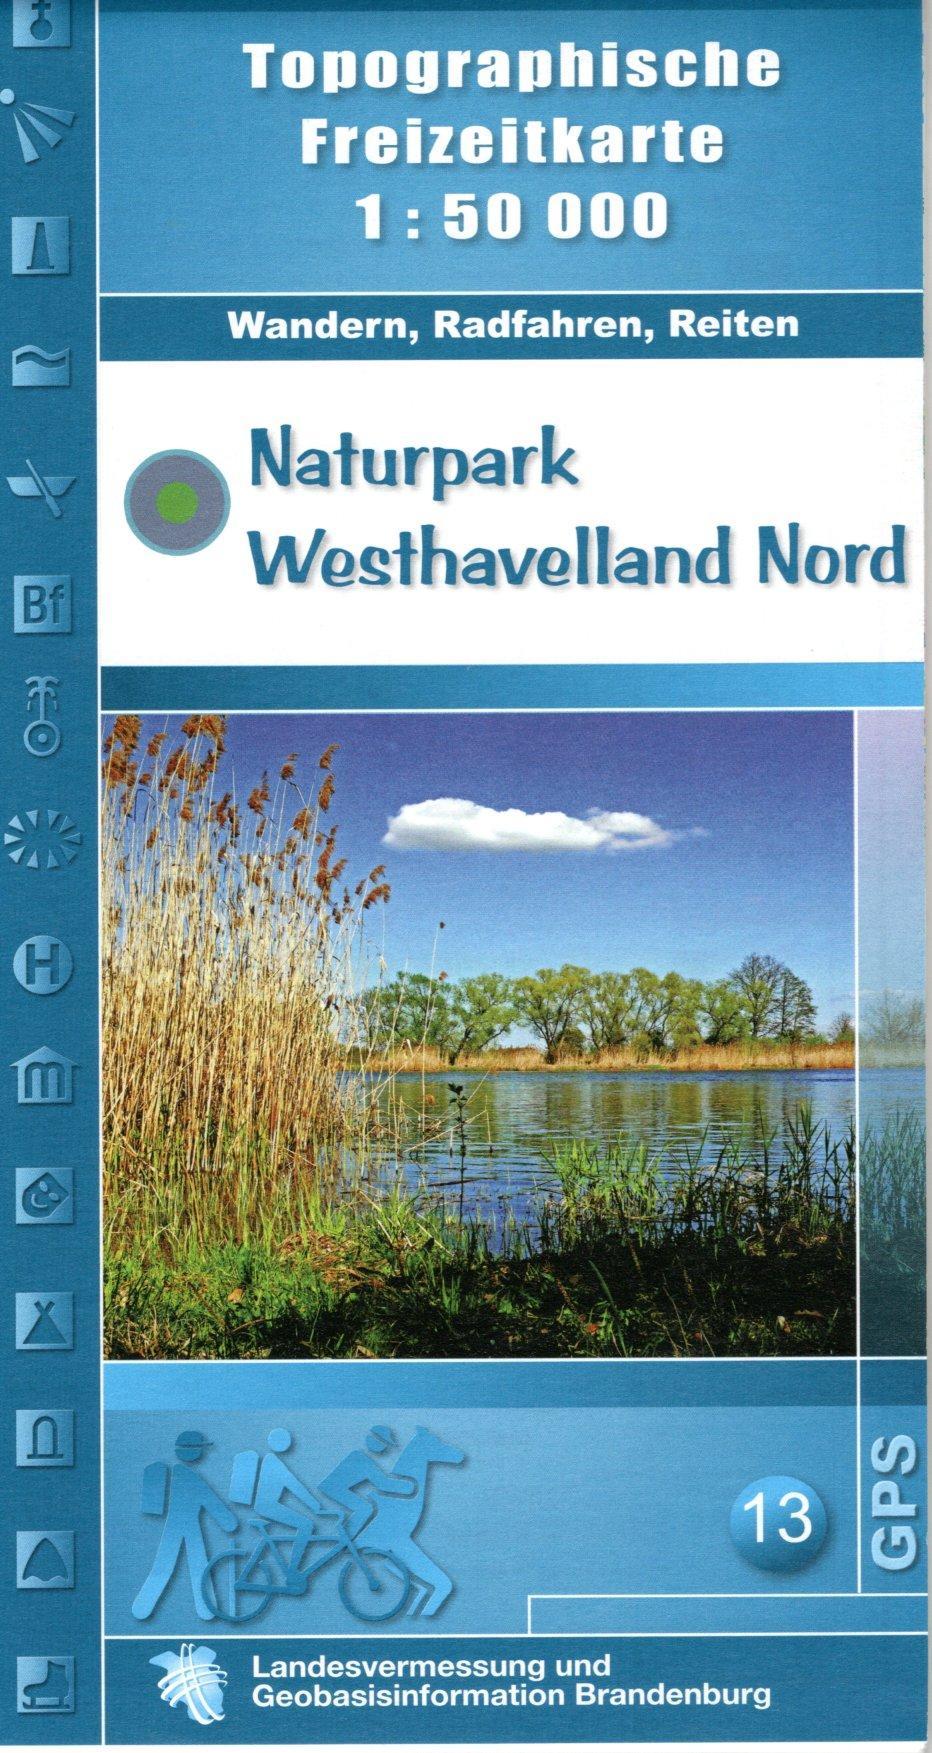 Naturpark Westhavelland Nord